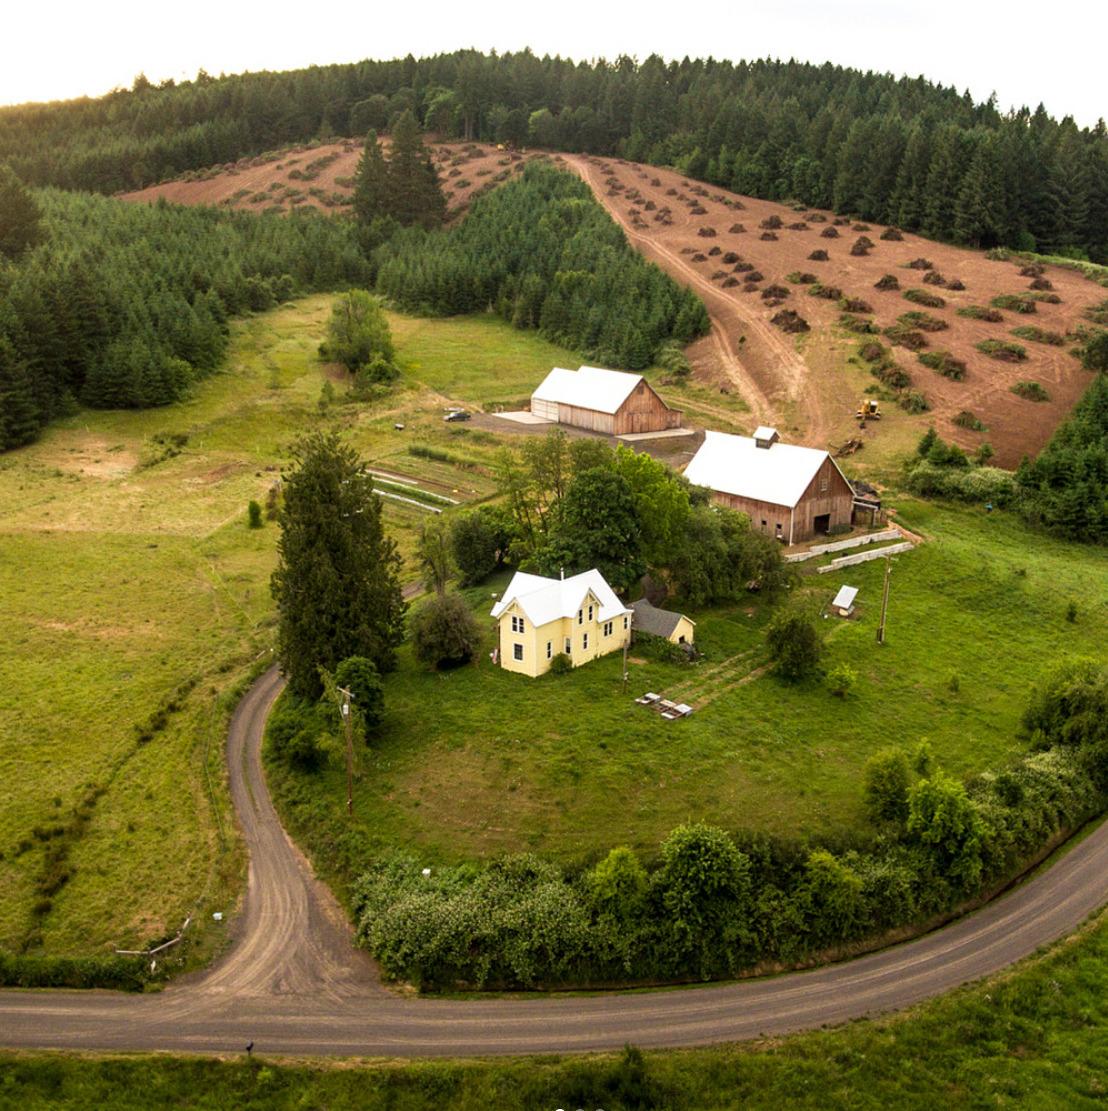 Screenshot_2018-08-20 Clare Carver - Big Table Farm ( bigtablefarm) • Instagram photos and videos(8).jpg